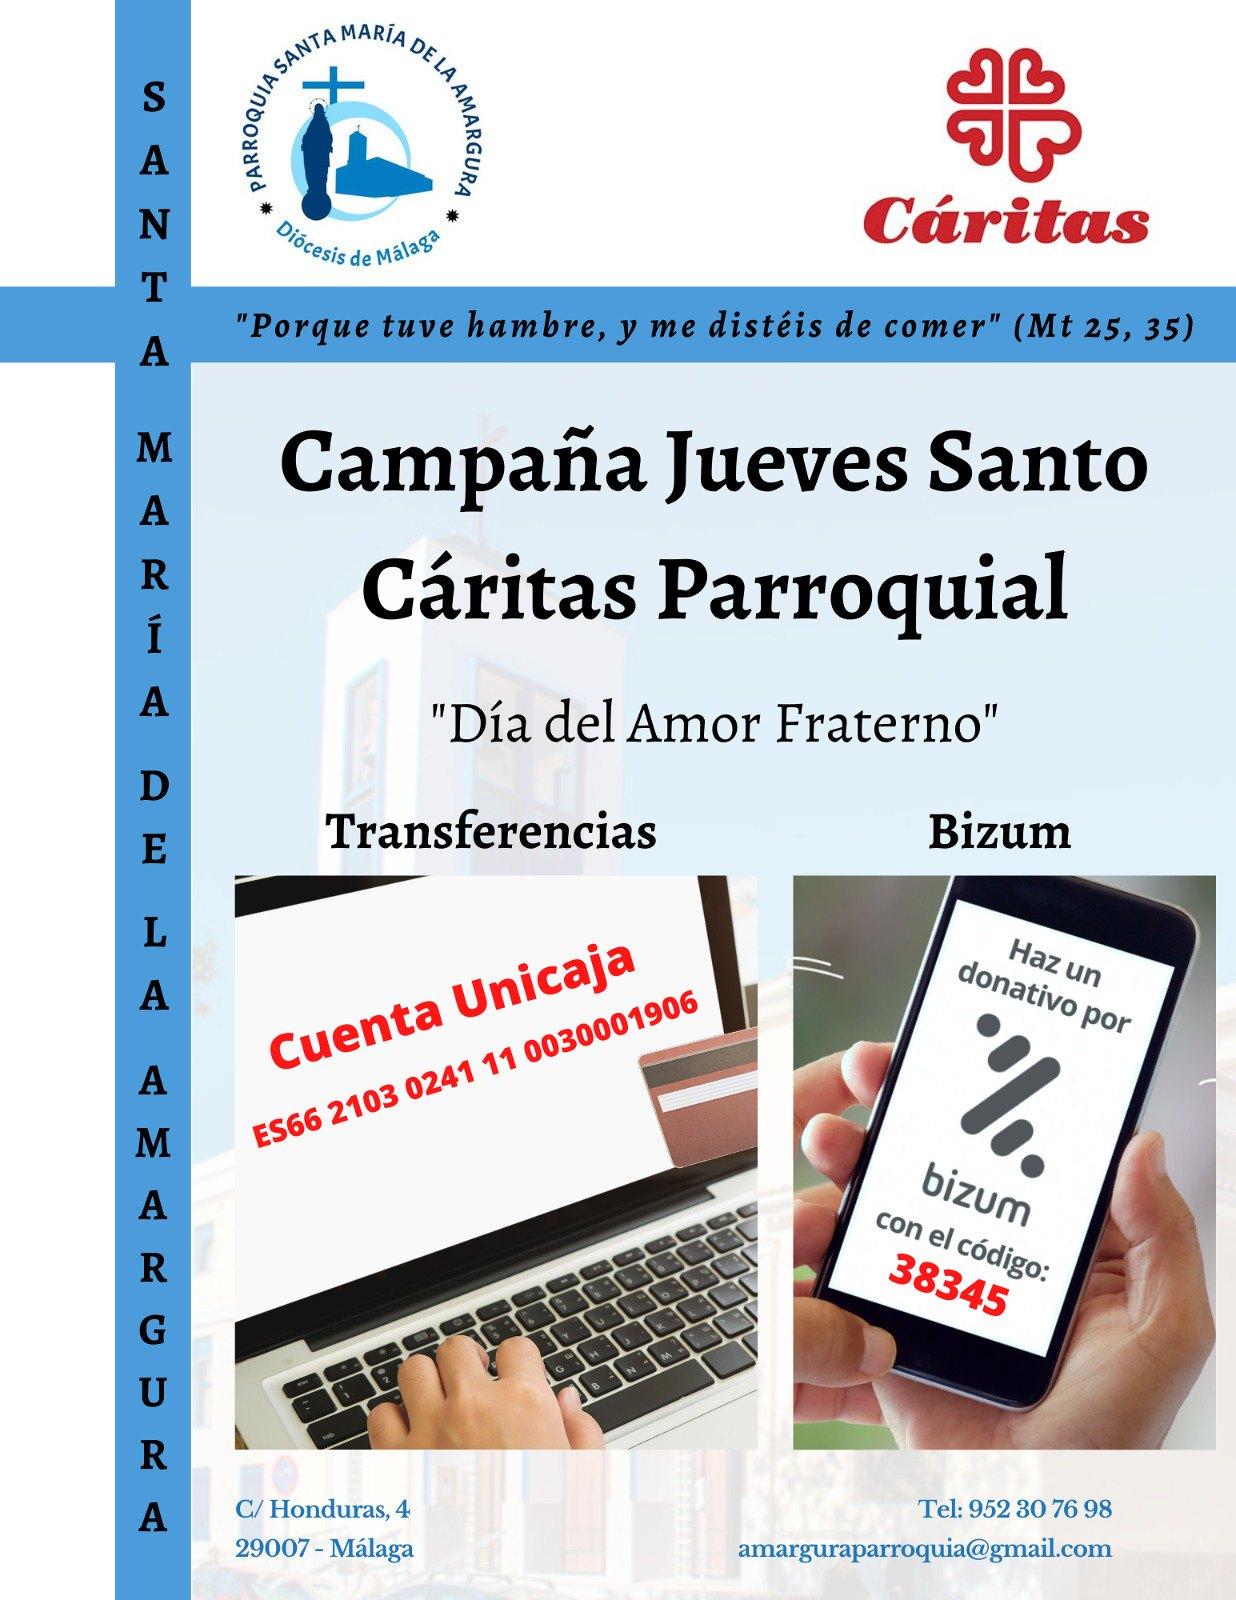 Campaña Jueves Santo Cáritas Parroquial 2021